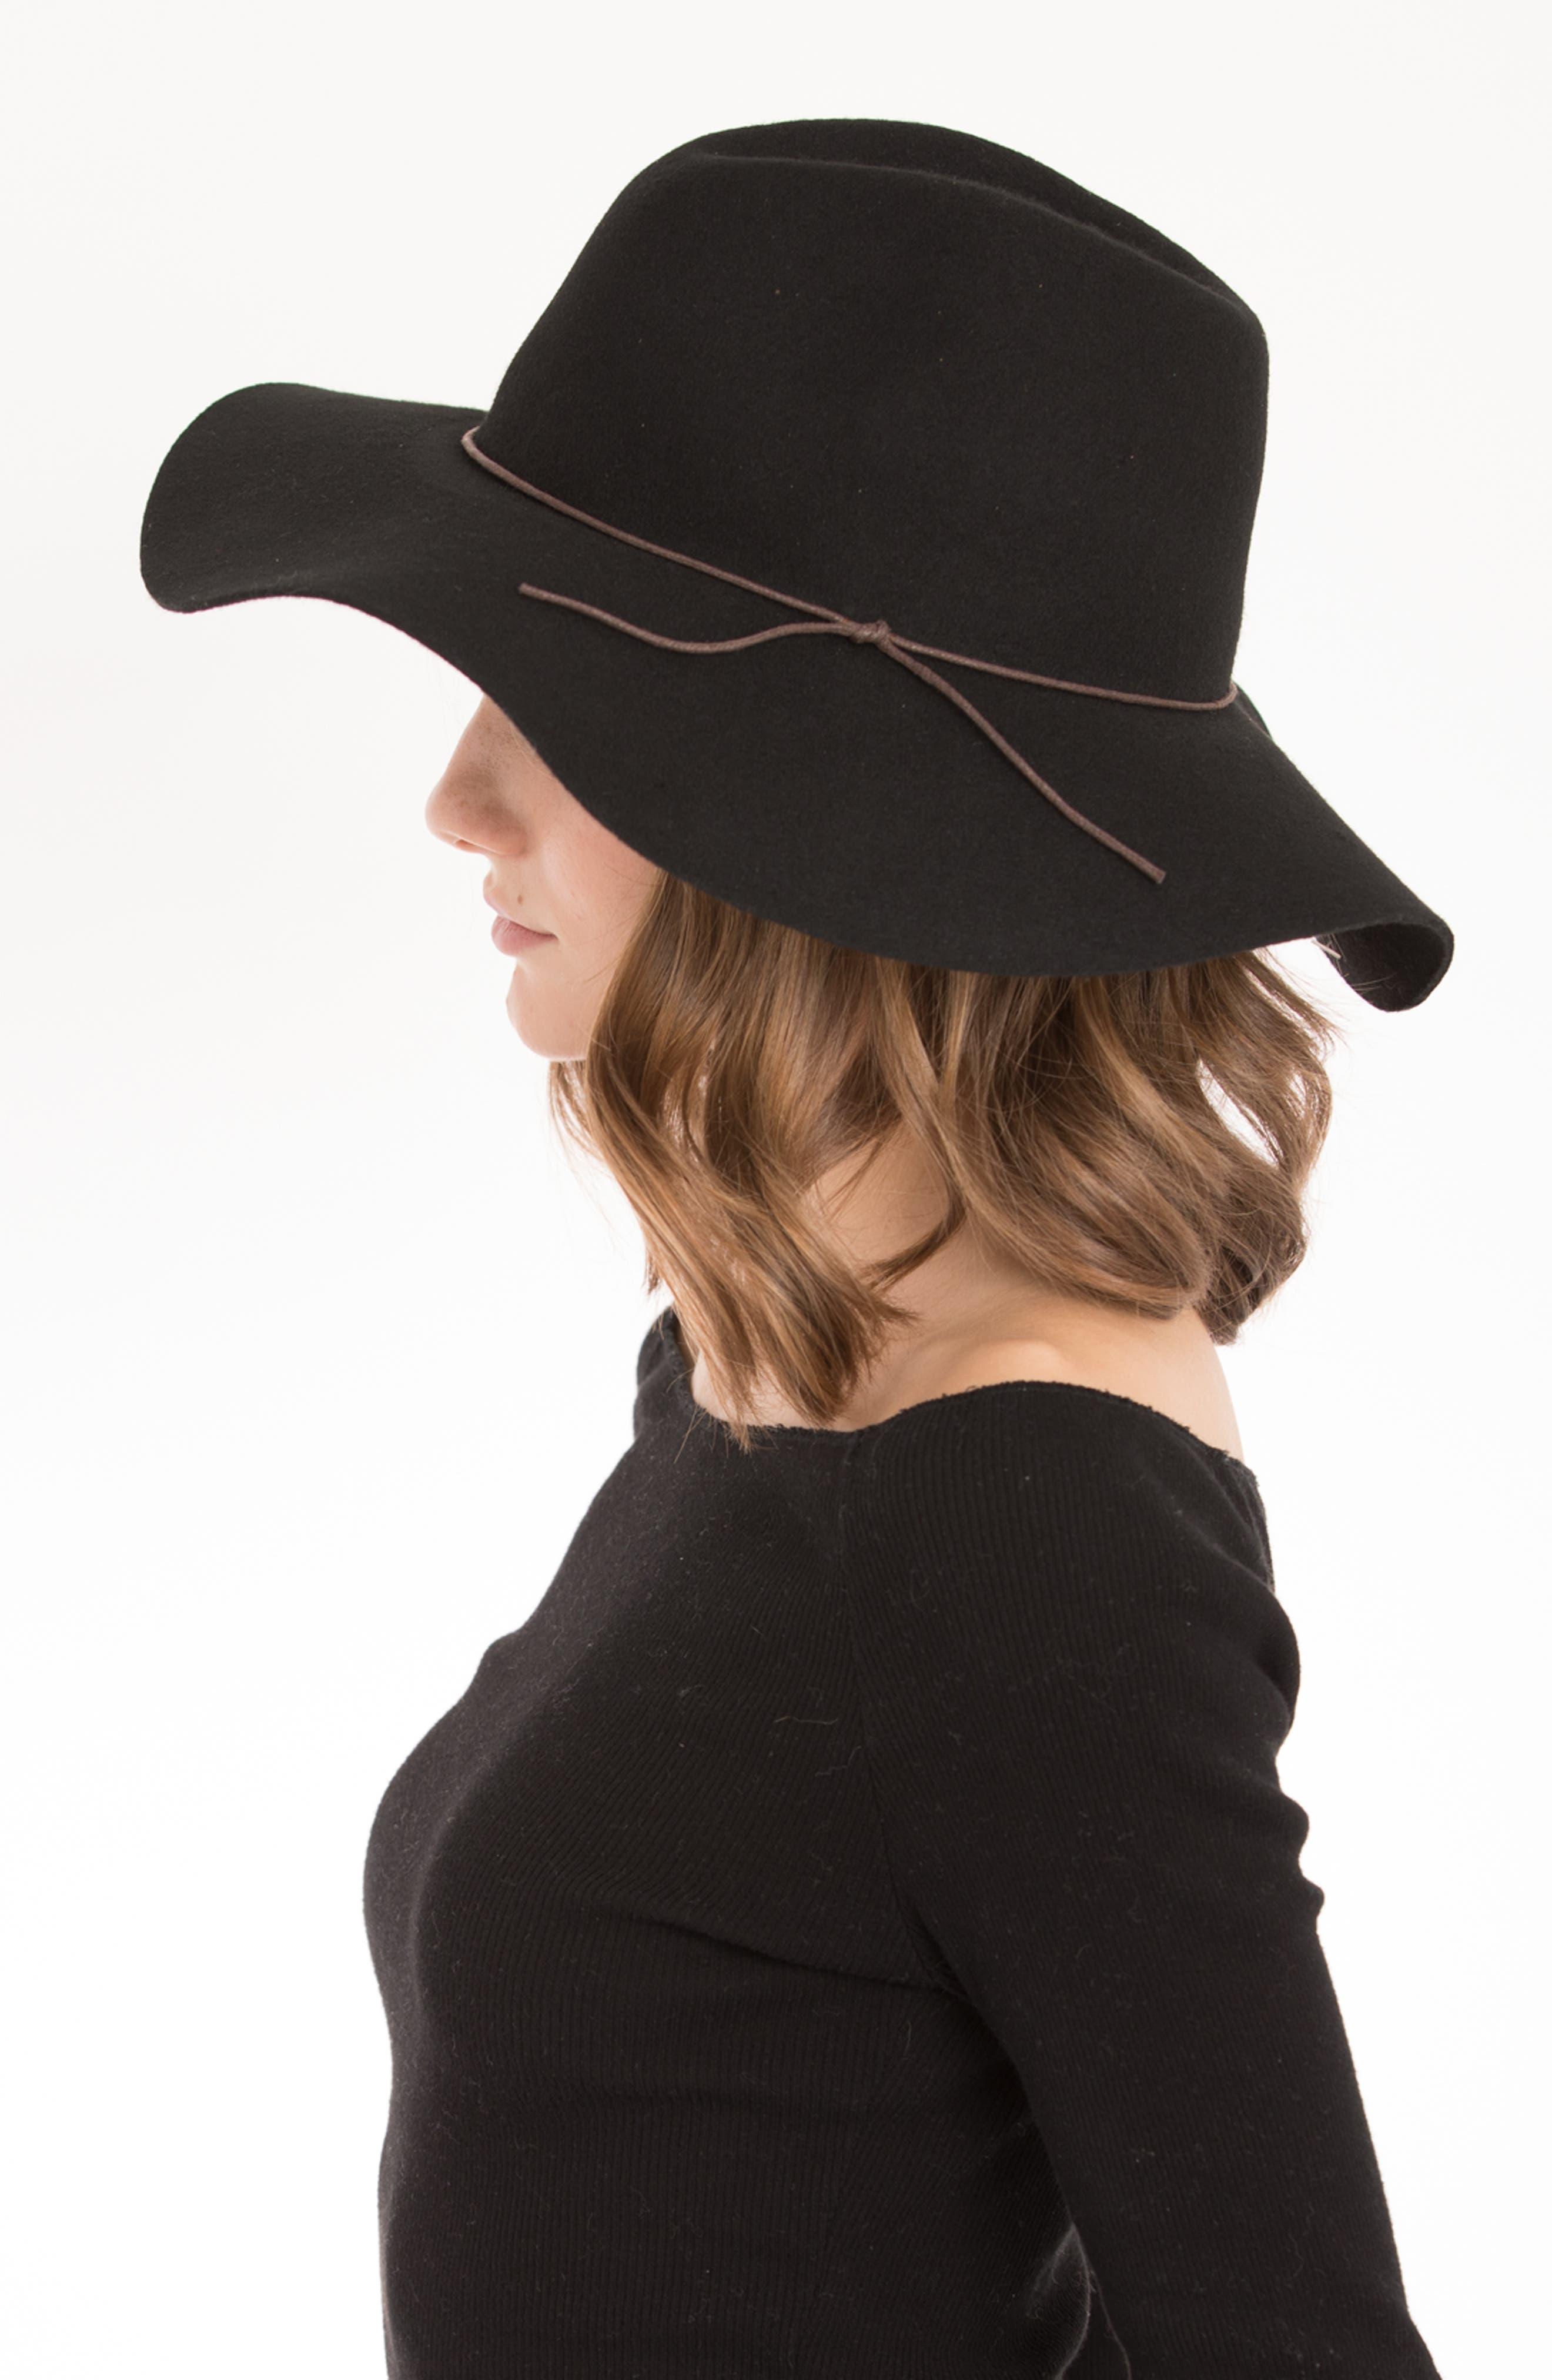 Zima Felted Wool Hat,                             Alternate thumbnail 3, color,                             BLACK